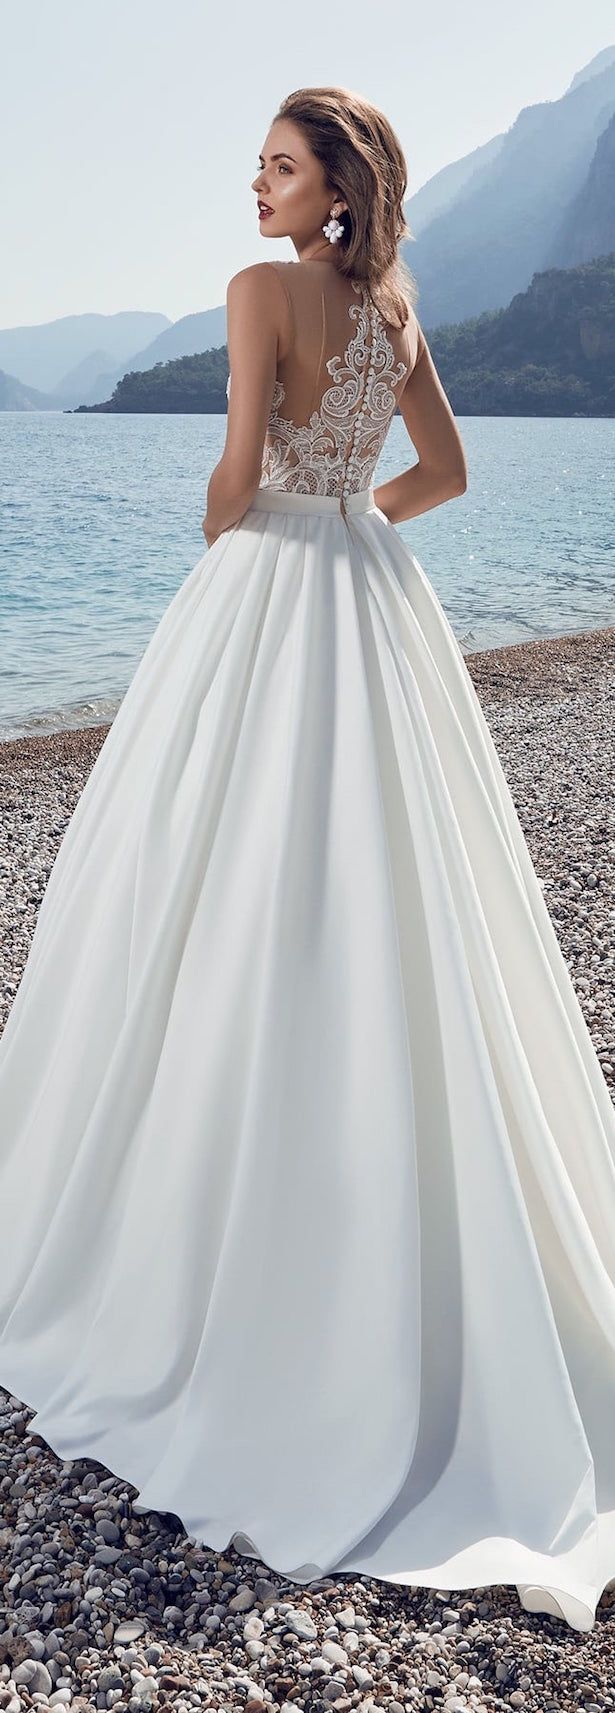 Lanesta Bridal – The Heart of The Ocean Collection